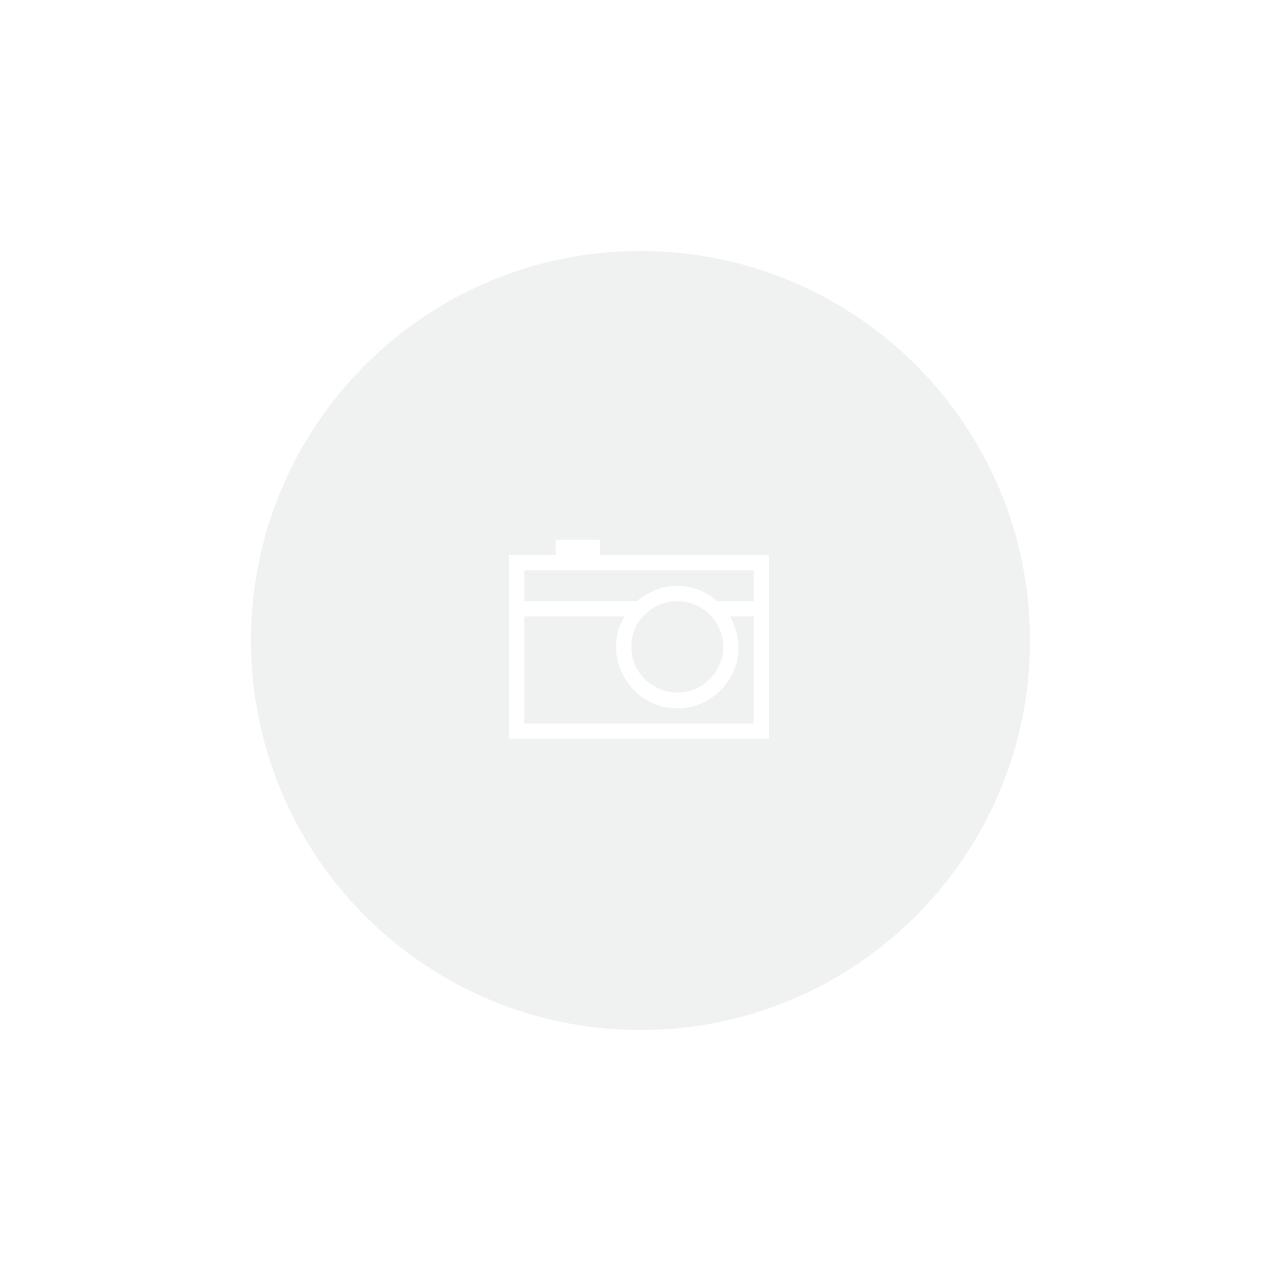 Grelha de Aço Inox 793x 340x 50 mm Canaleta Tramontina